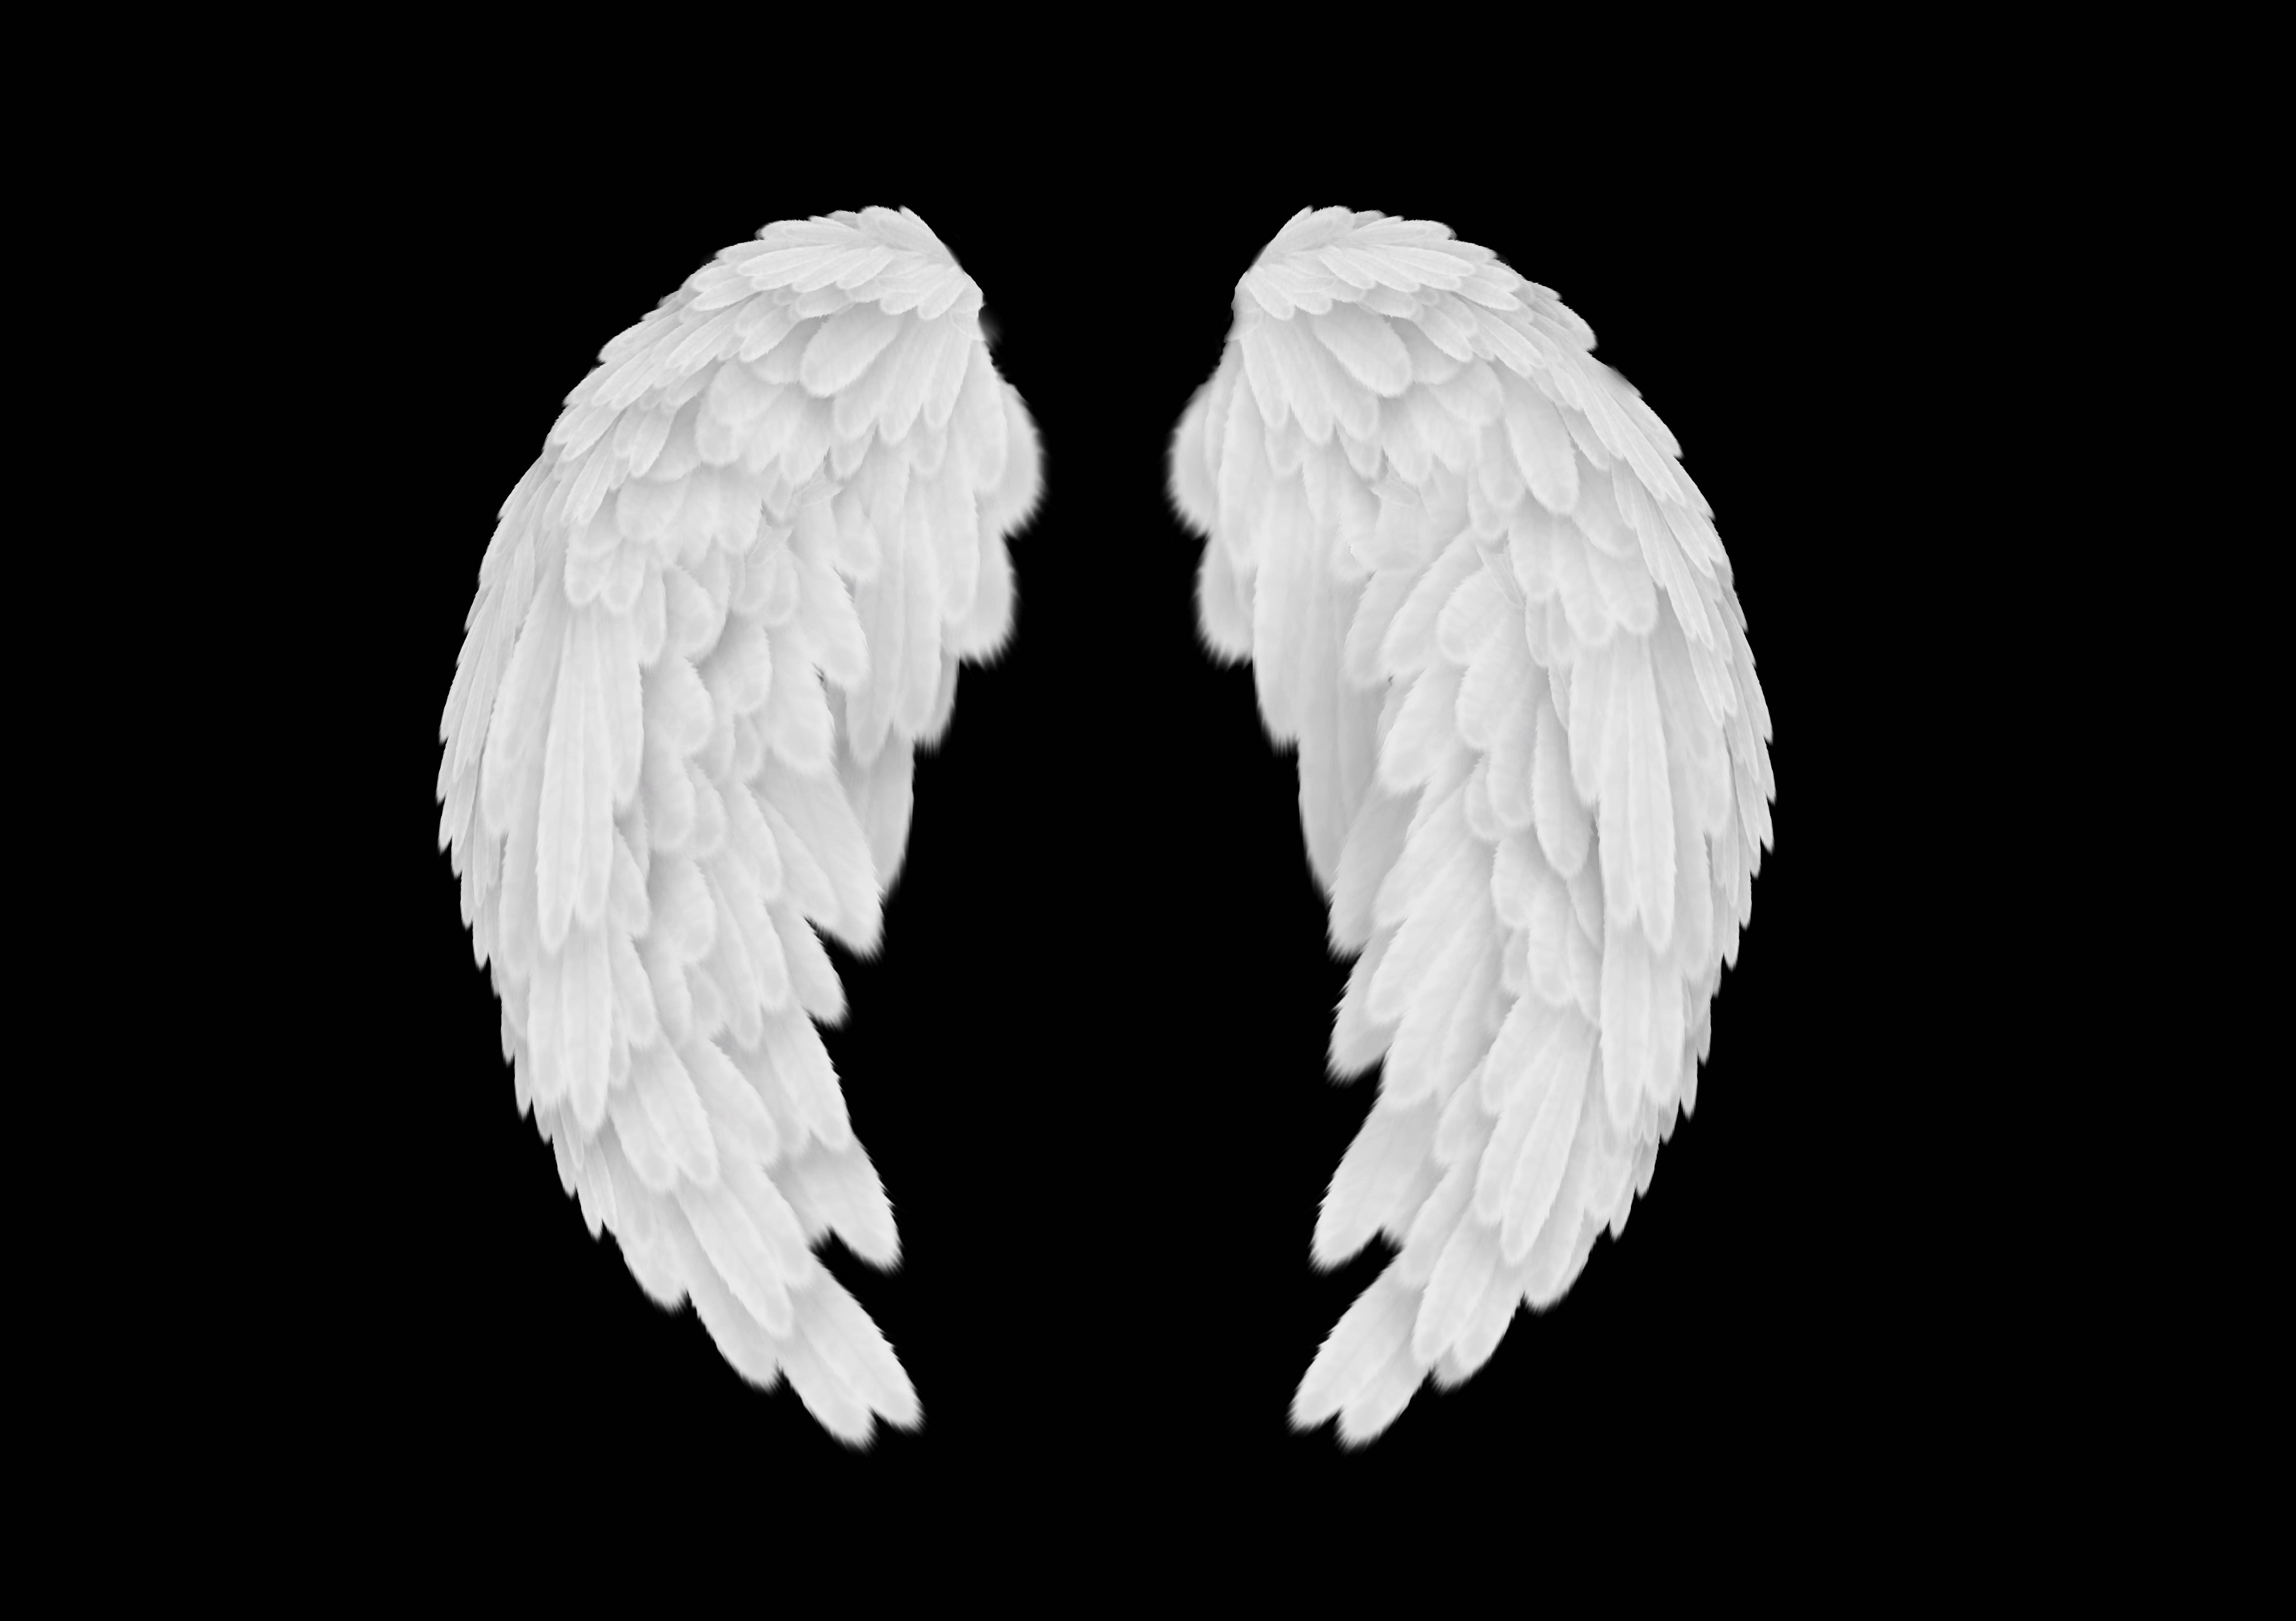 Картинки подтекстом, картинки крыло ангела